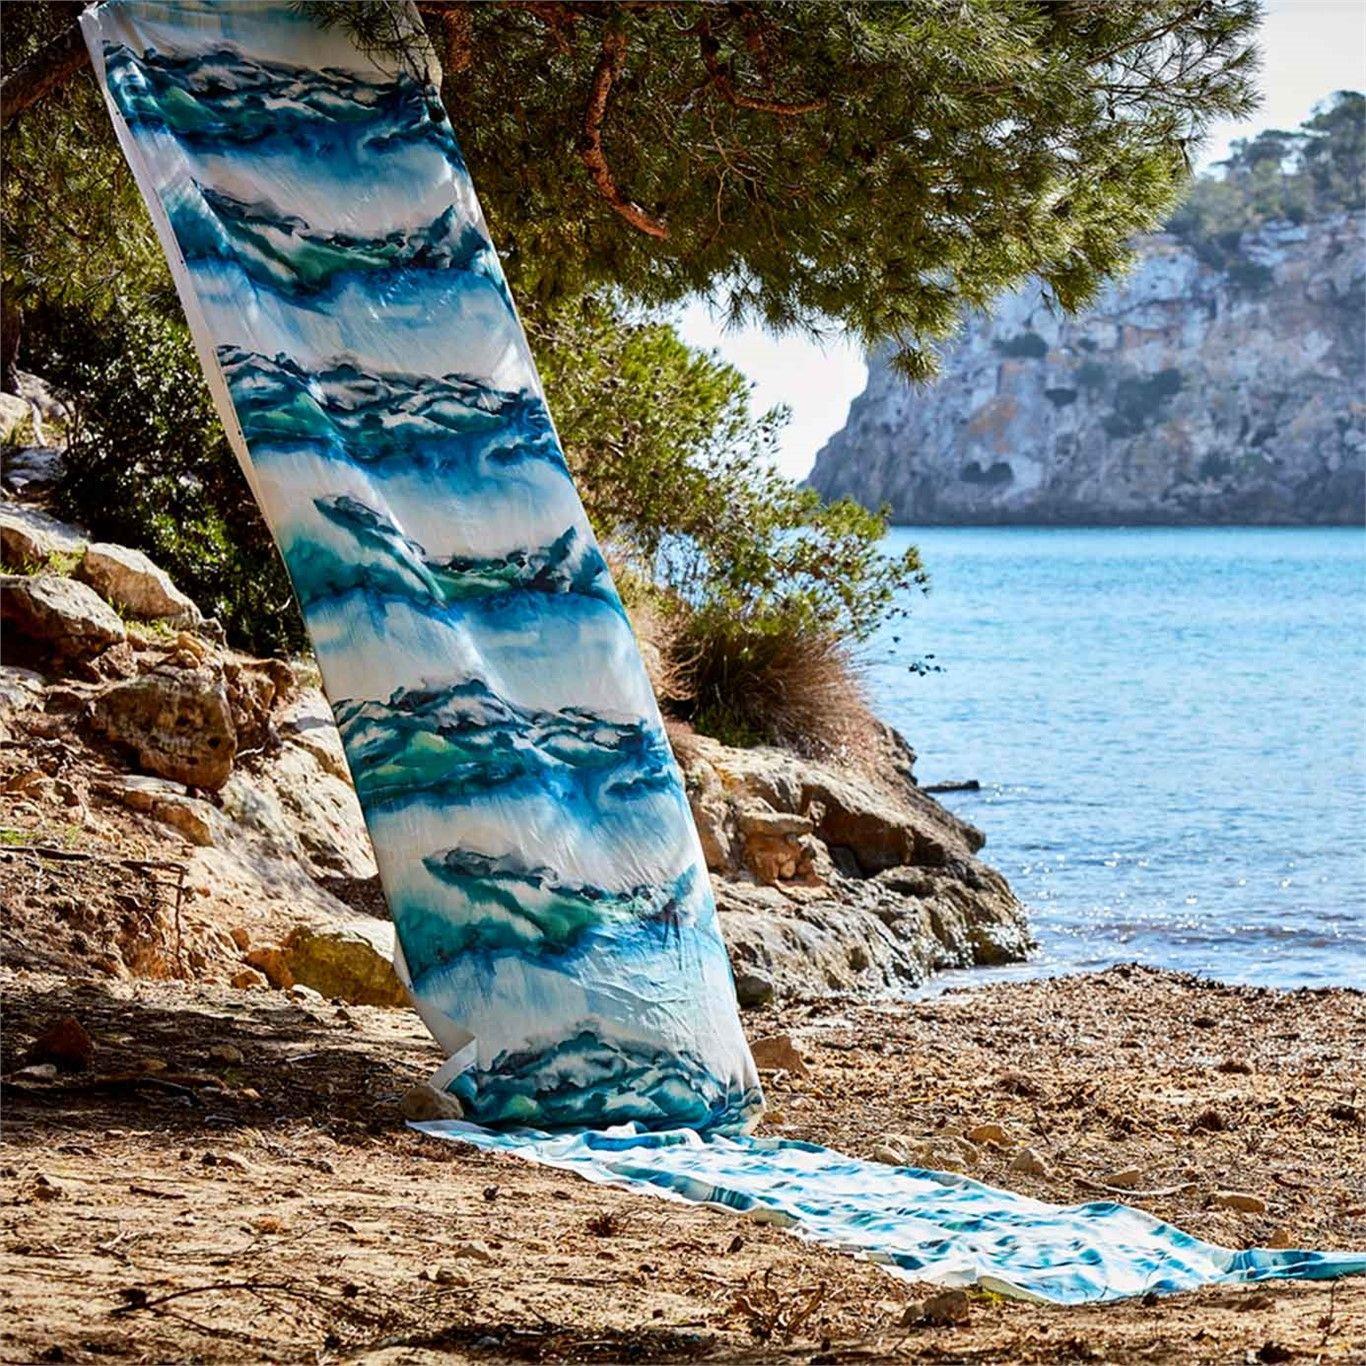 Products harlequin designer fabrics and wallpapers paradise - Products Harlequin Designer Fabrics And Wallpapers Kailani Hanz120607 Anthozoa Fabrics